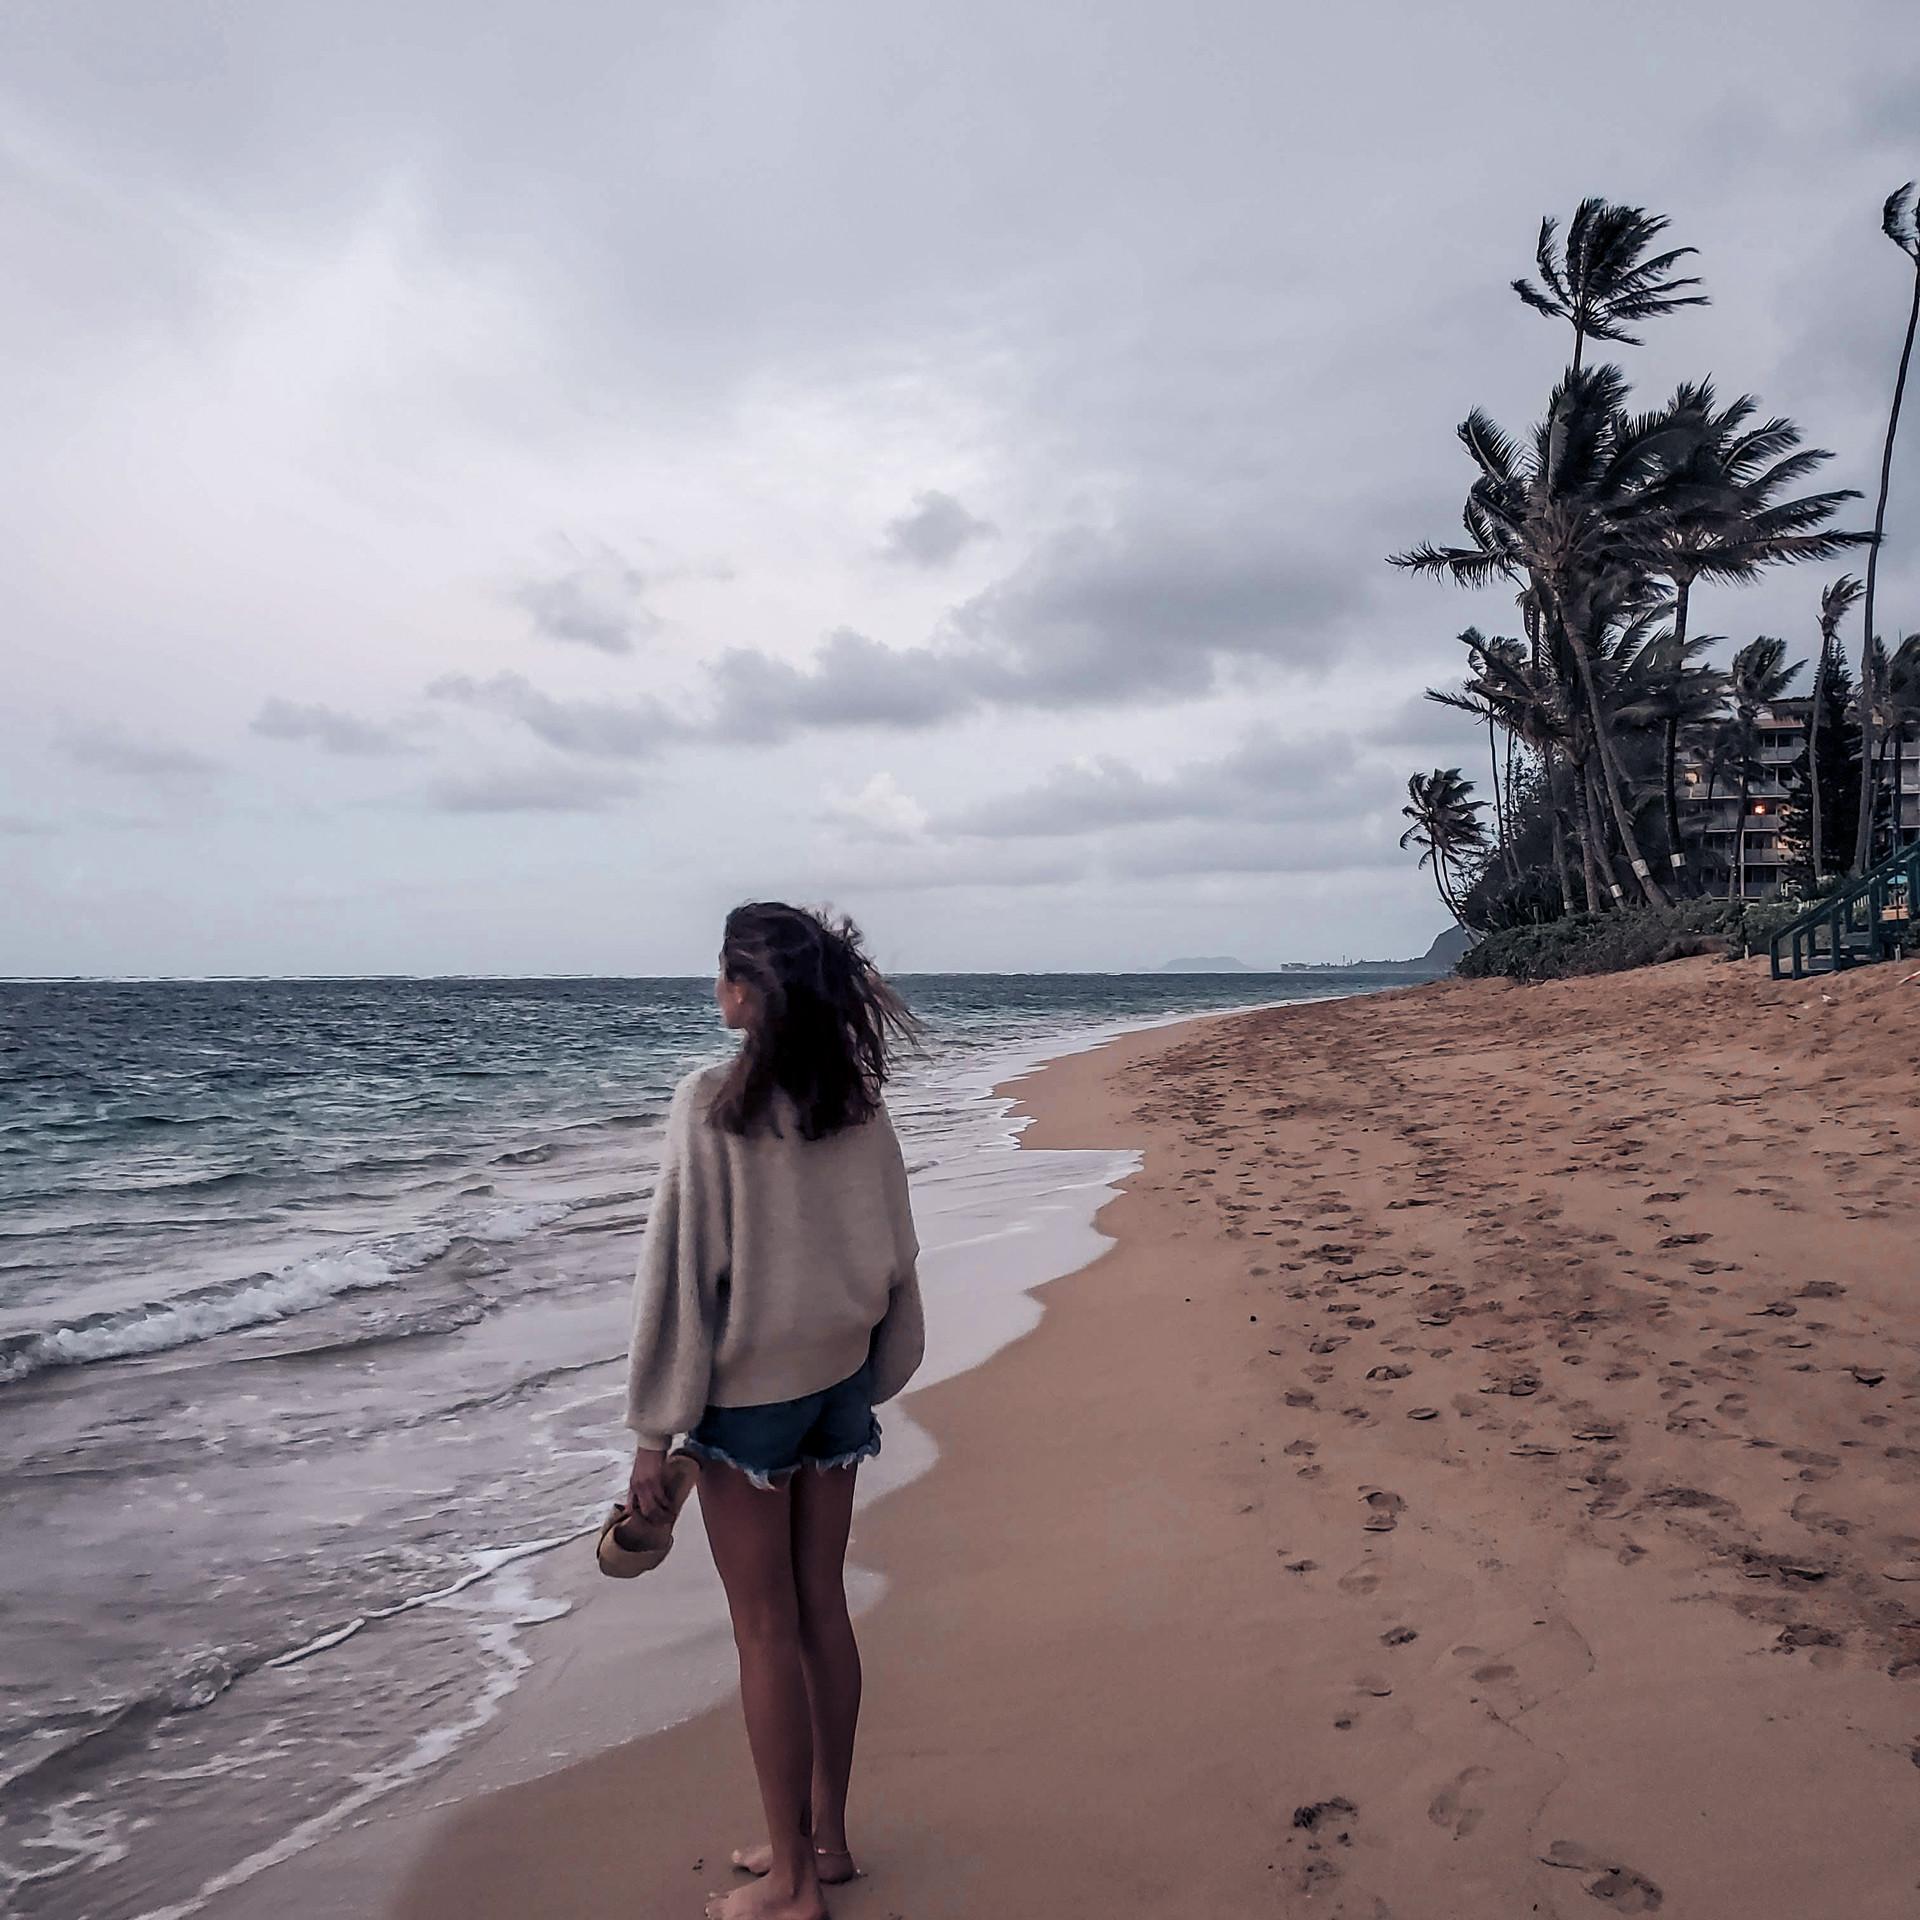 apartment's Private beach